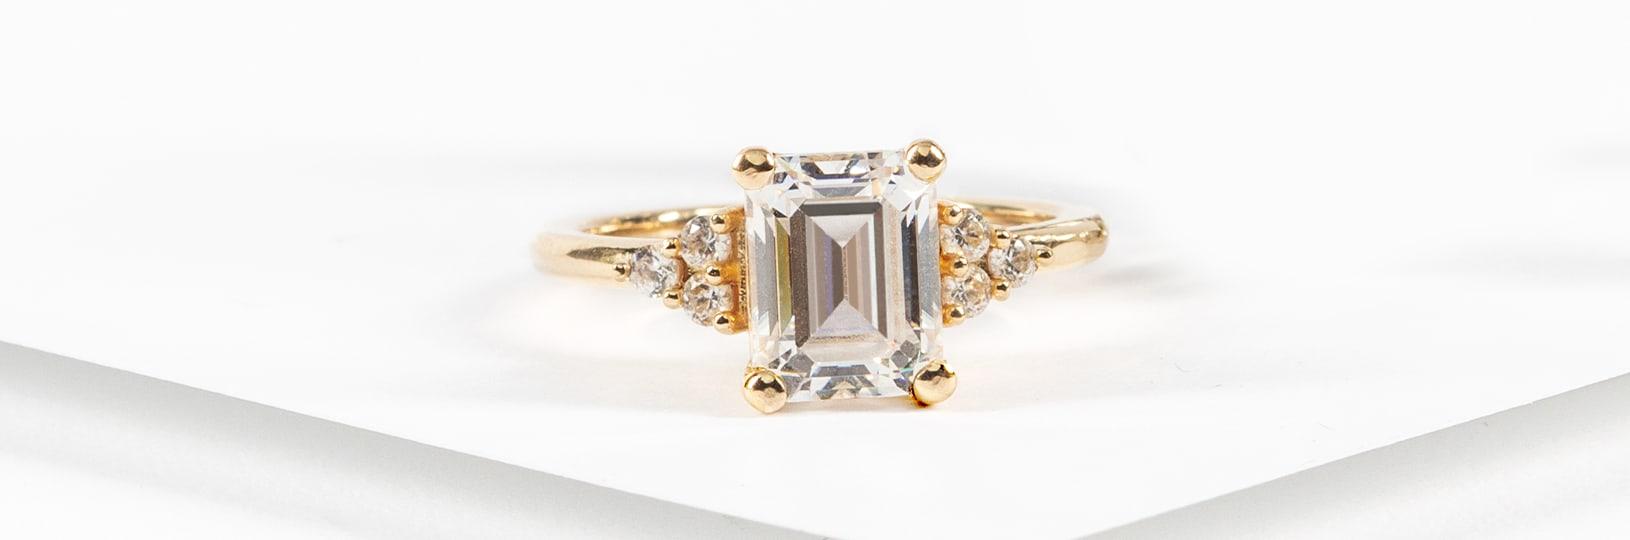 An engagement ring featuring an emerald cut center stone